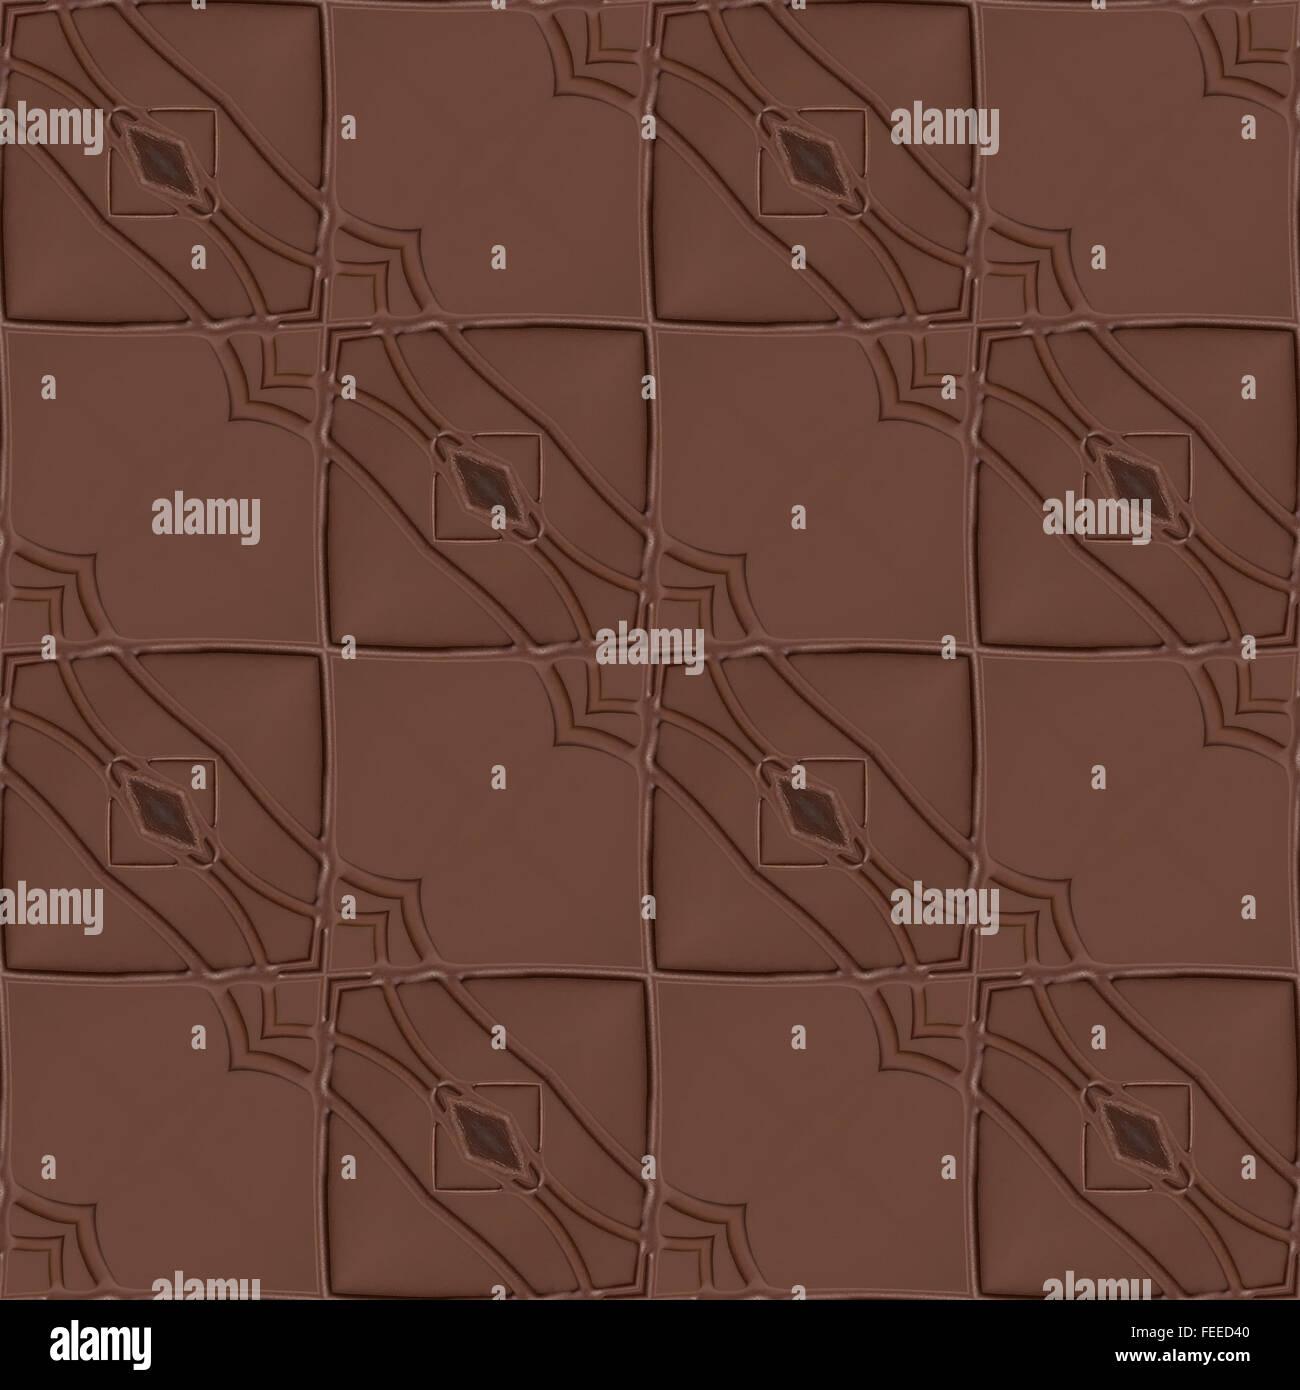 Chocolate Block Seamless Texture Pattern - Stock Image